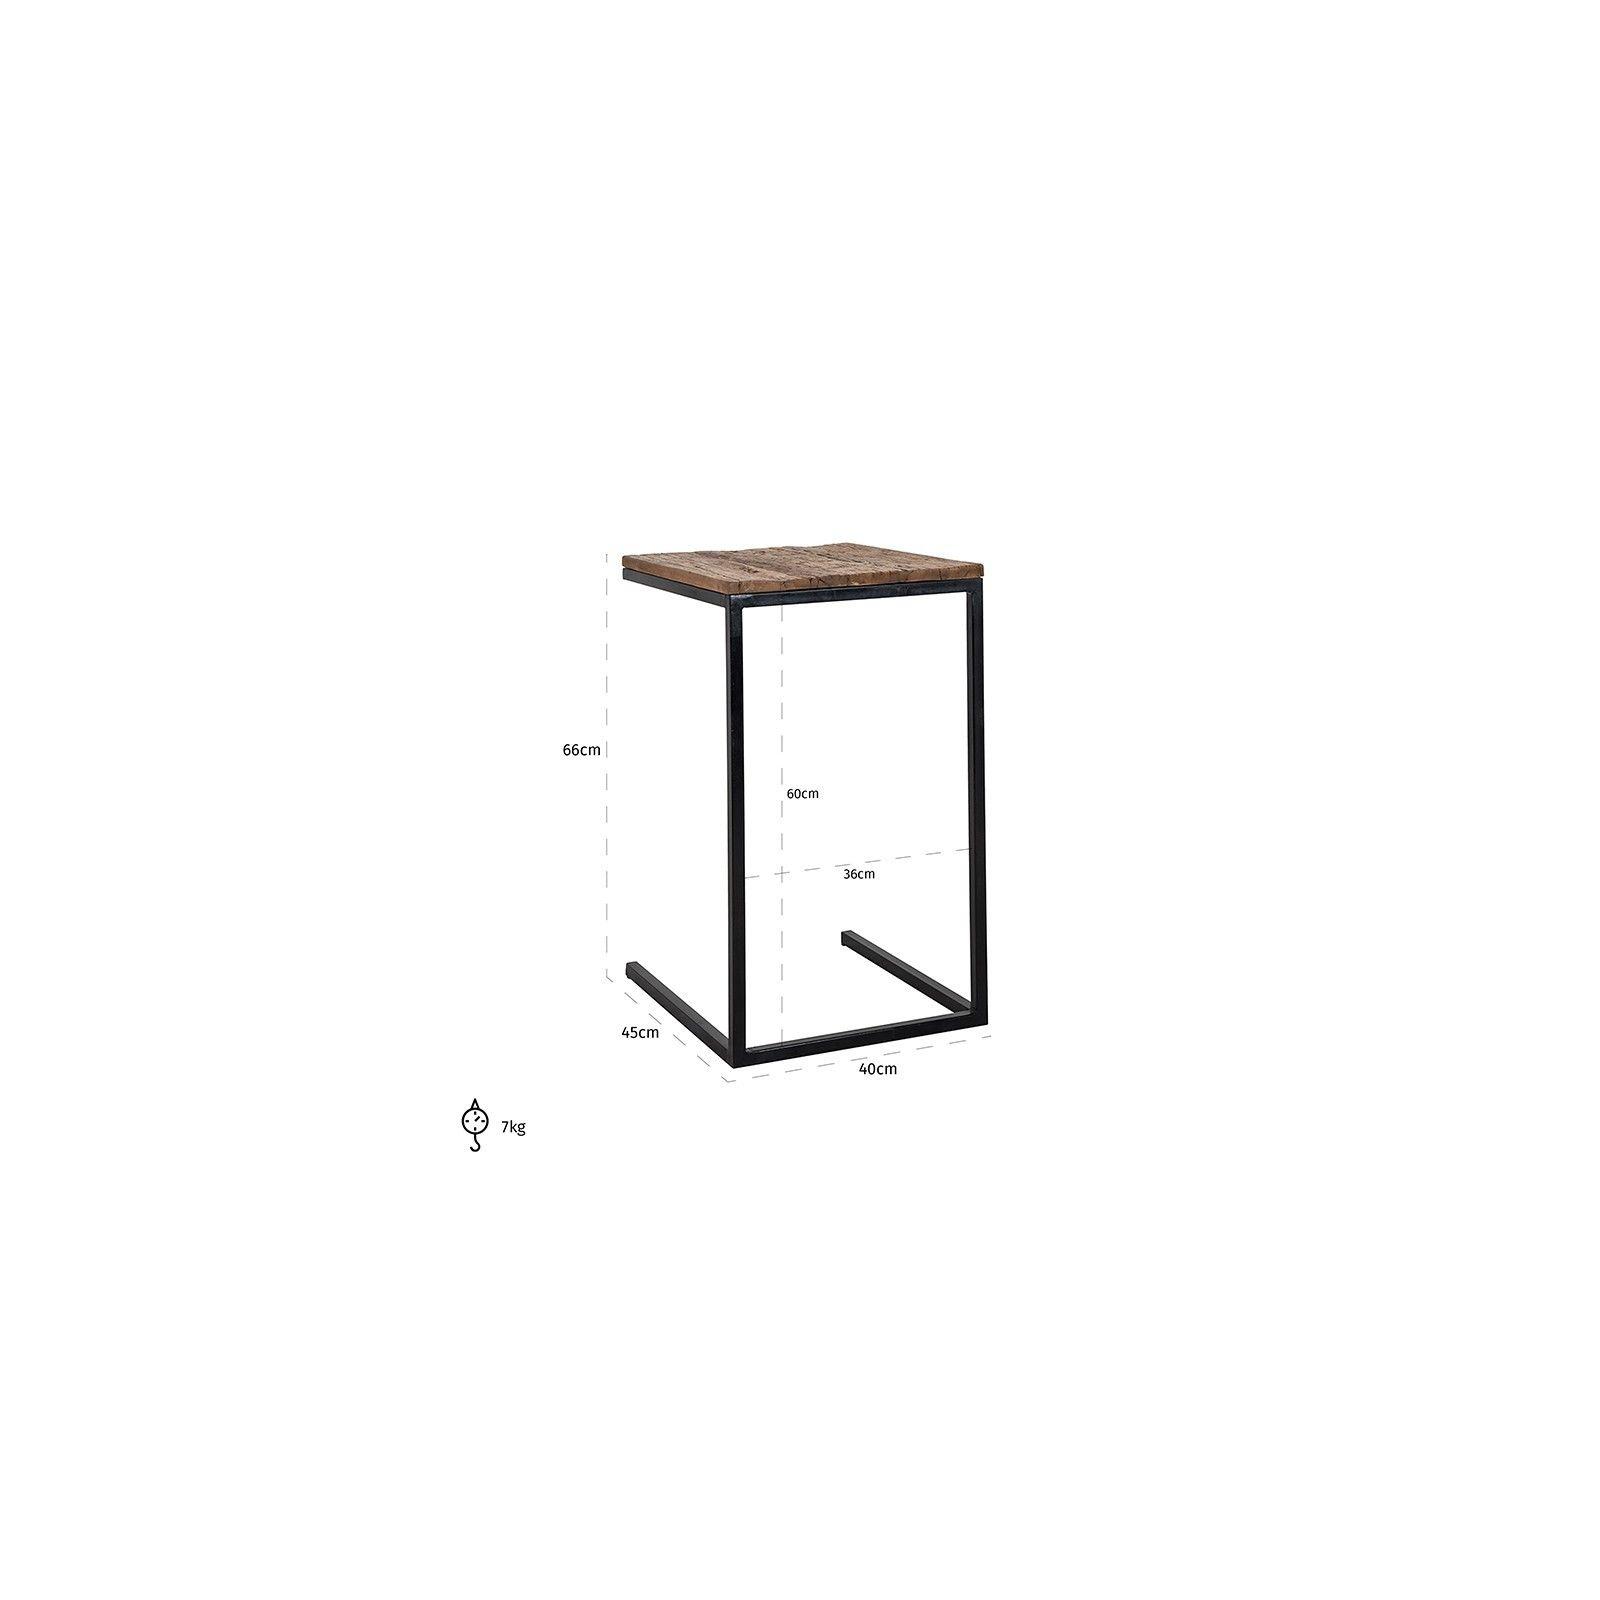 Table d'appoint Raffles, Recyceld wood Meuble Déco Tendance - 216